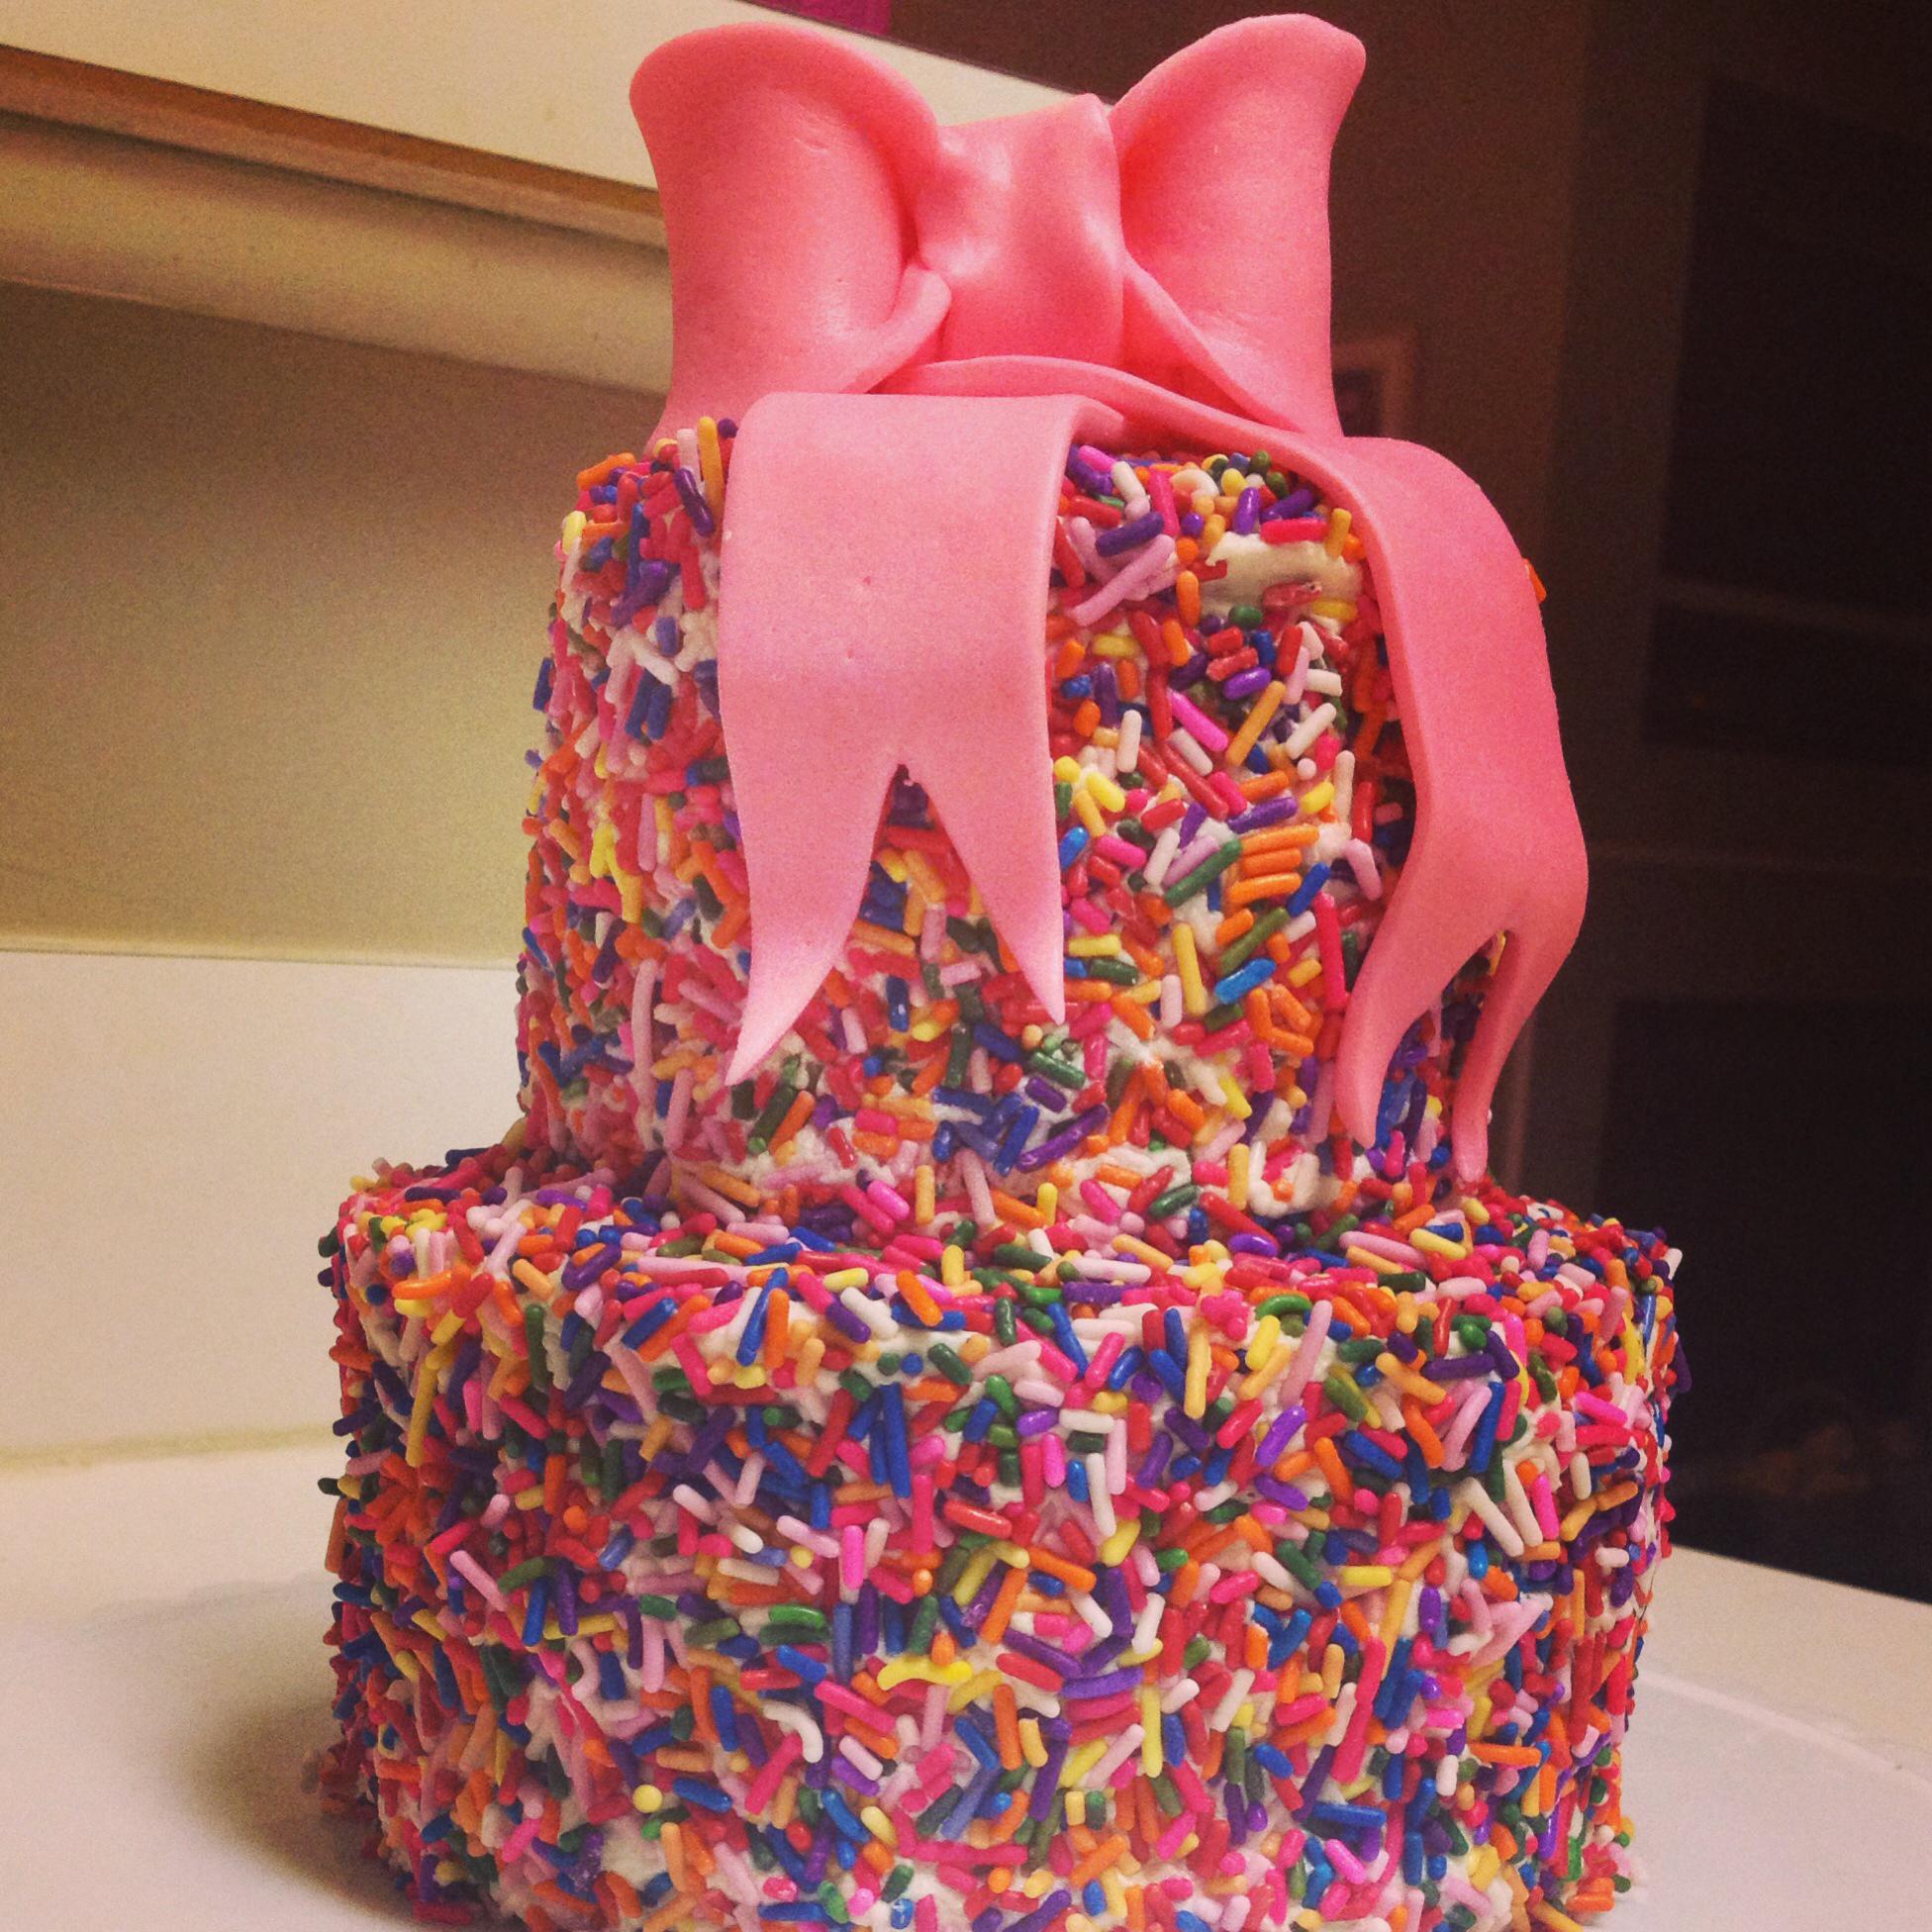 11 Sheet Cakes For A 19th Birthday Photo 19th Birthday Cake Happy